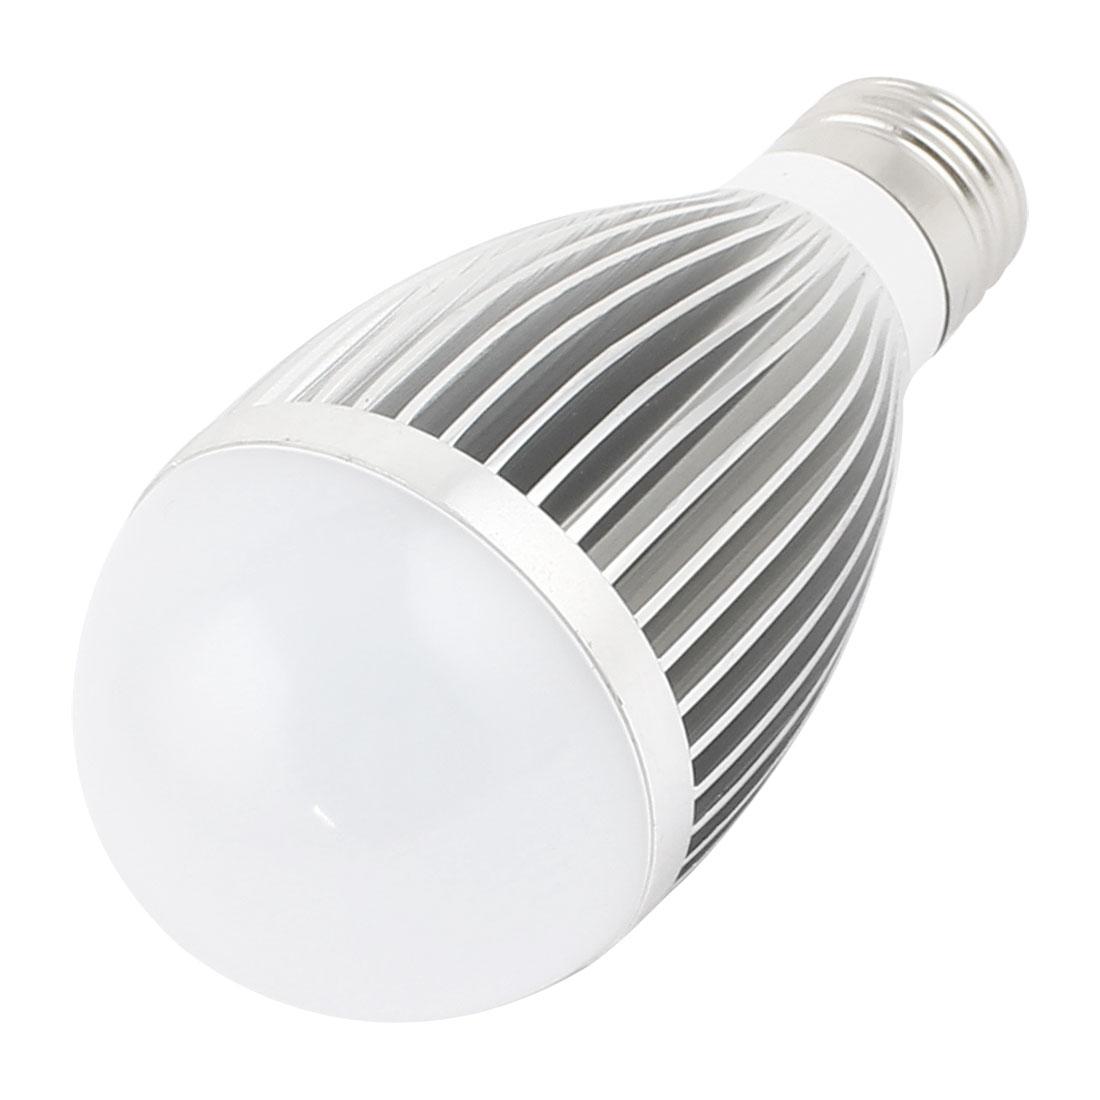 7W Silver Tone E27 58mm Dia Globe Ball Bulb Lamp Shell LED Aluminum Heatsink